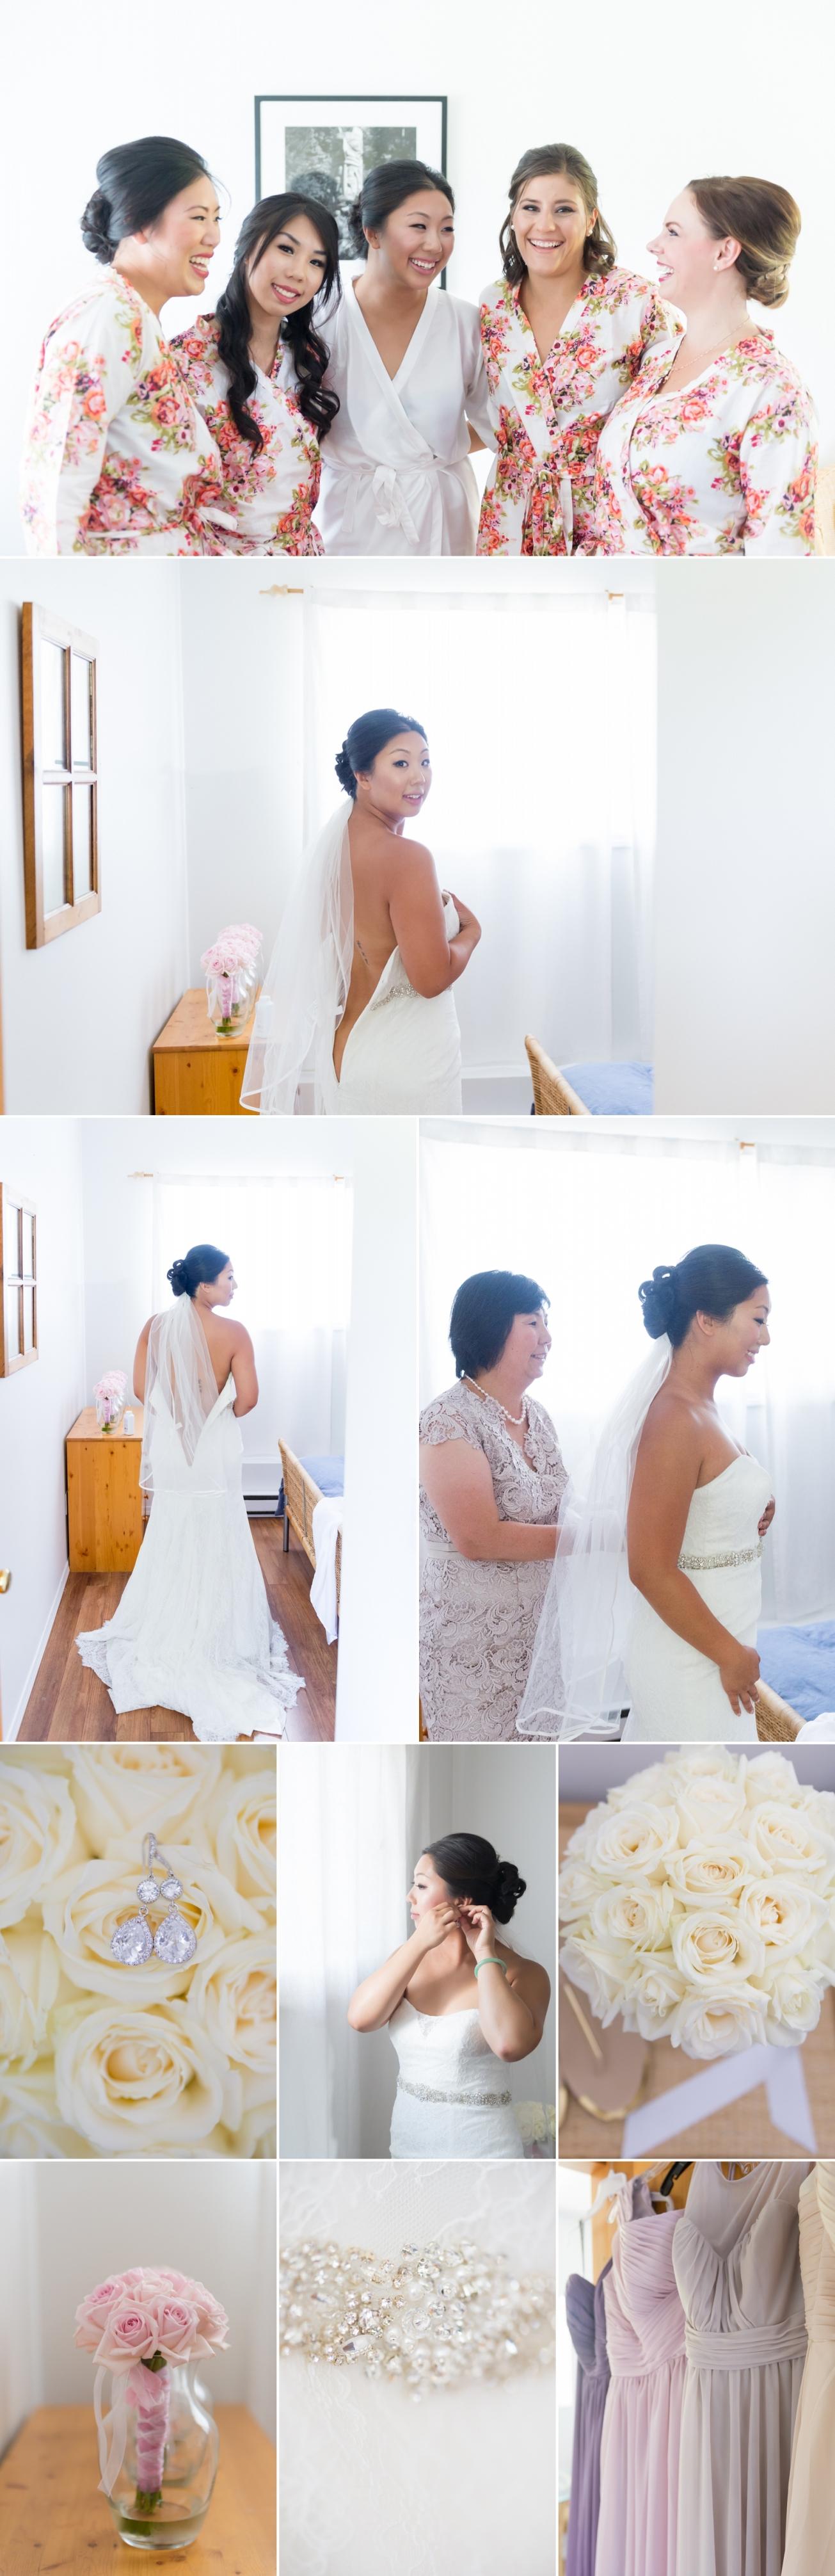 Tantalus Winery Wedding - Kelowna Okanagan - Suzanne le Stage 3